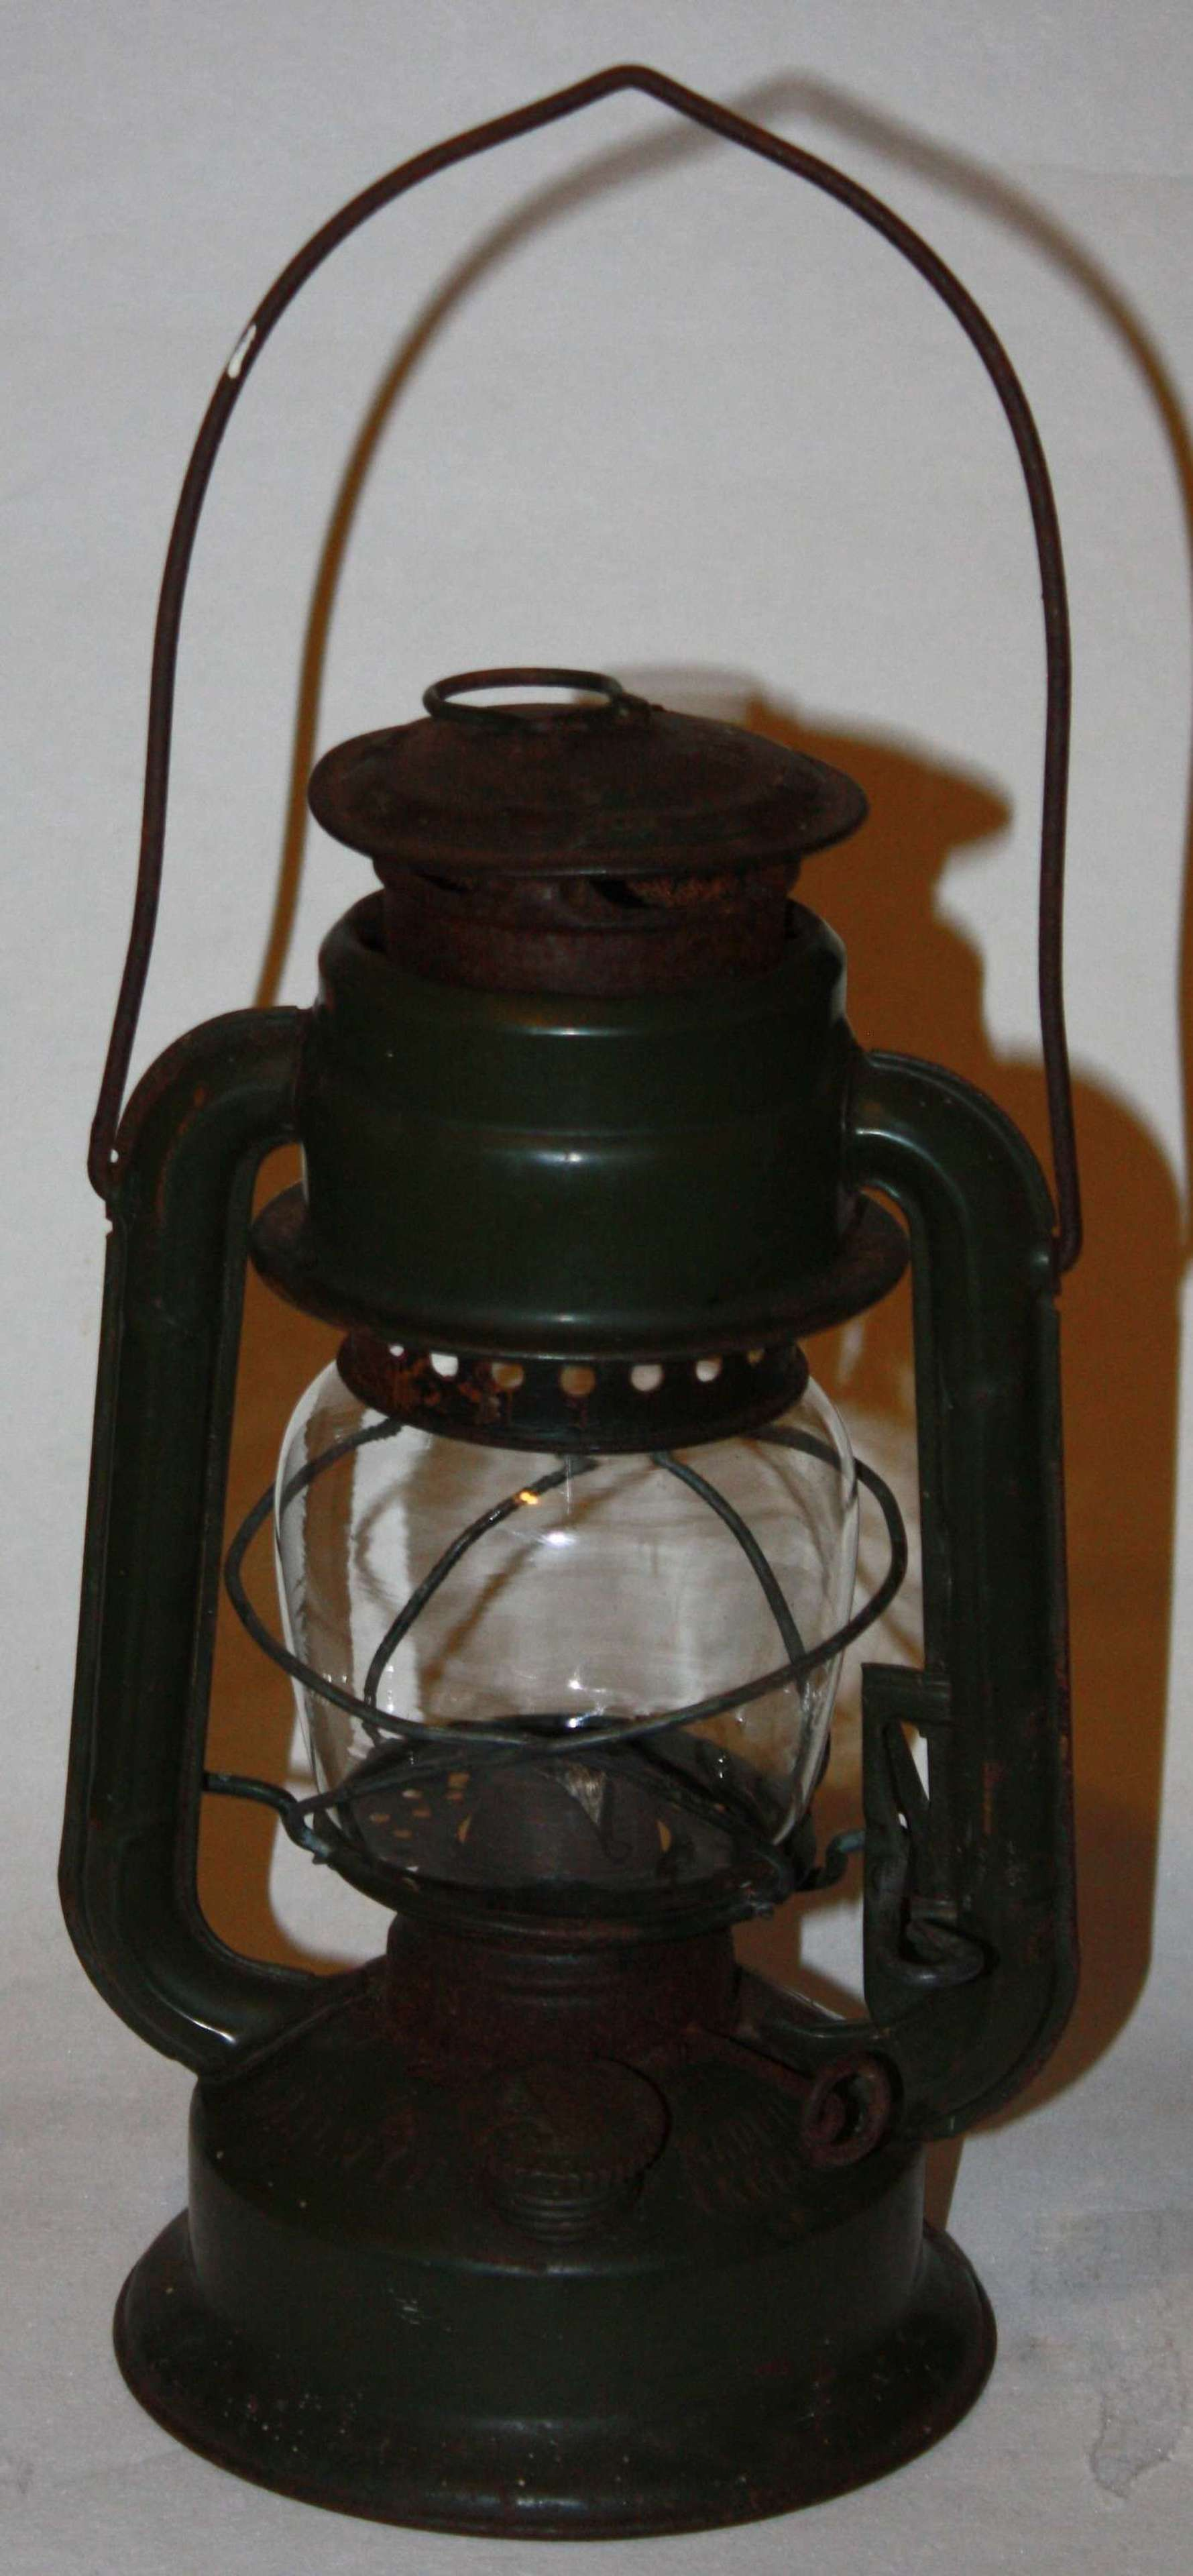 A RAF AM MARKED HURRICAN LAMP